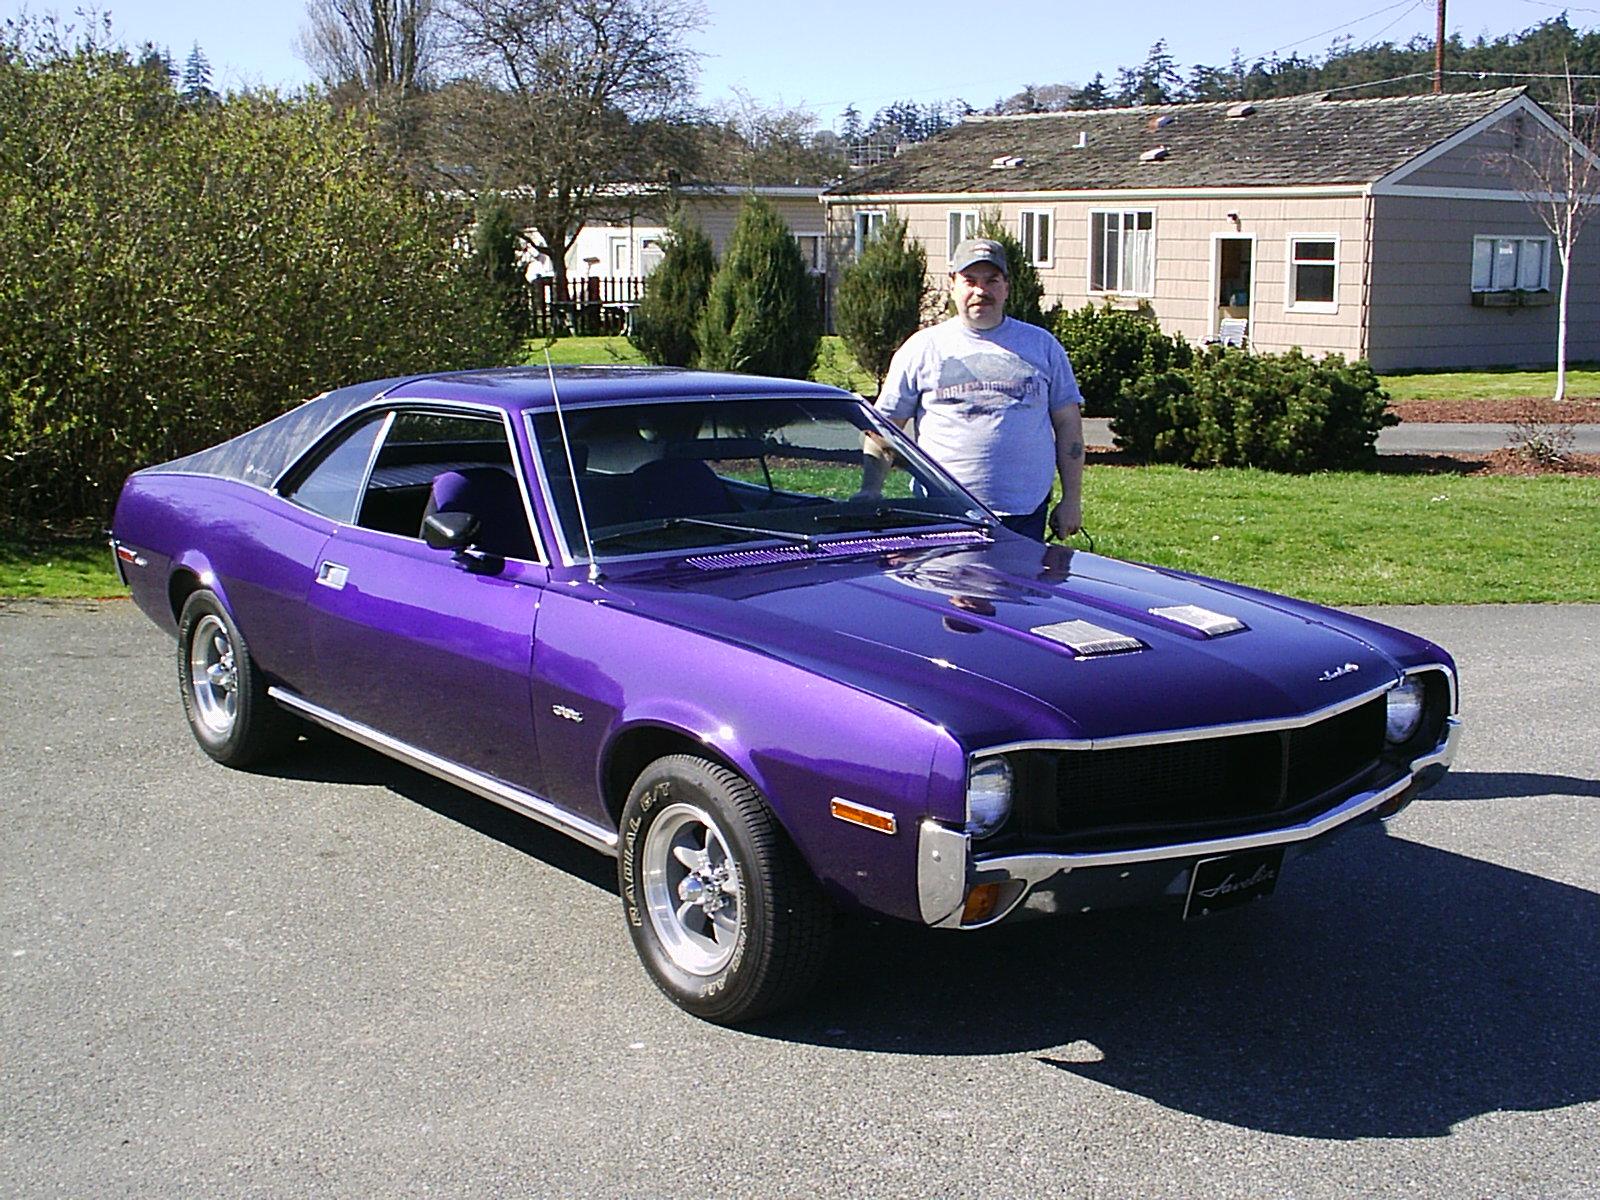 amc javelin photos reviews news specs buy car